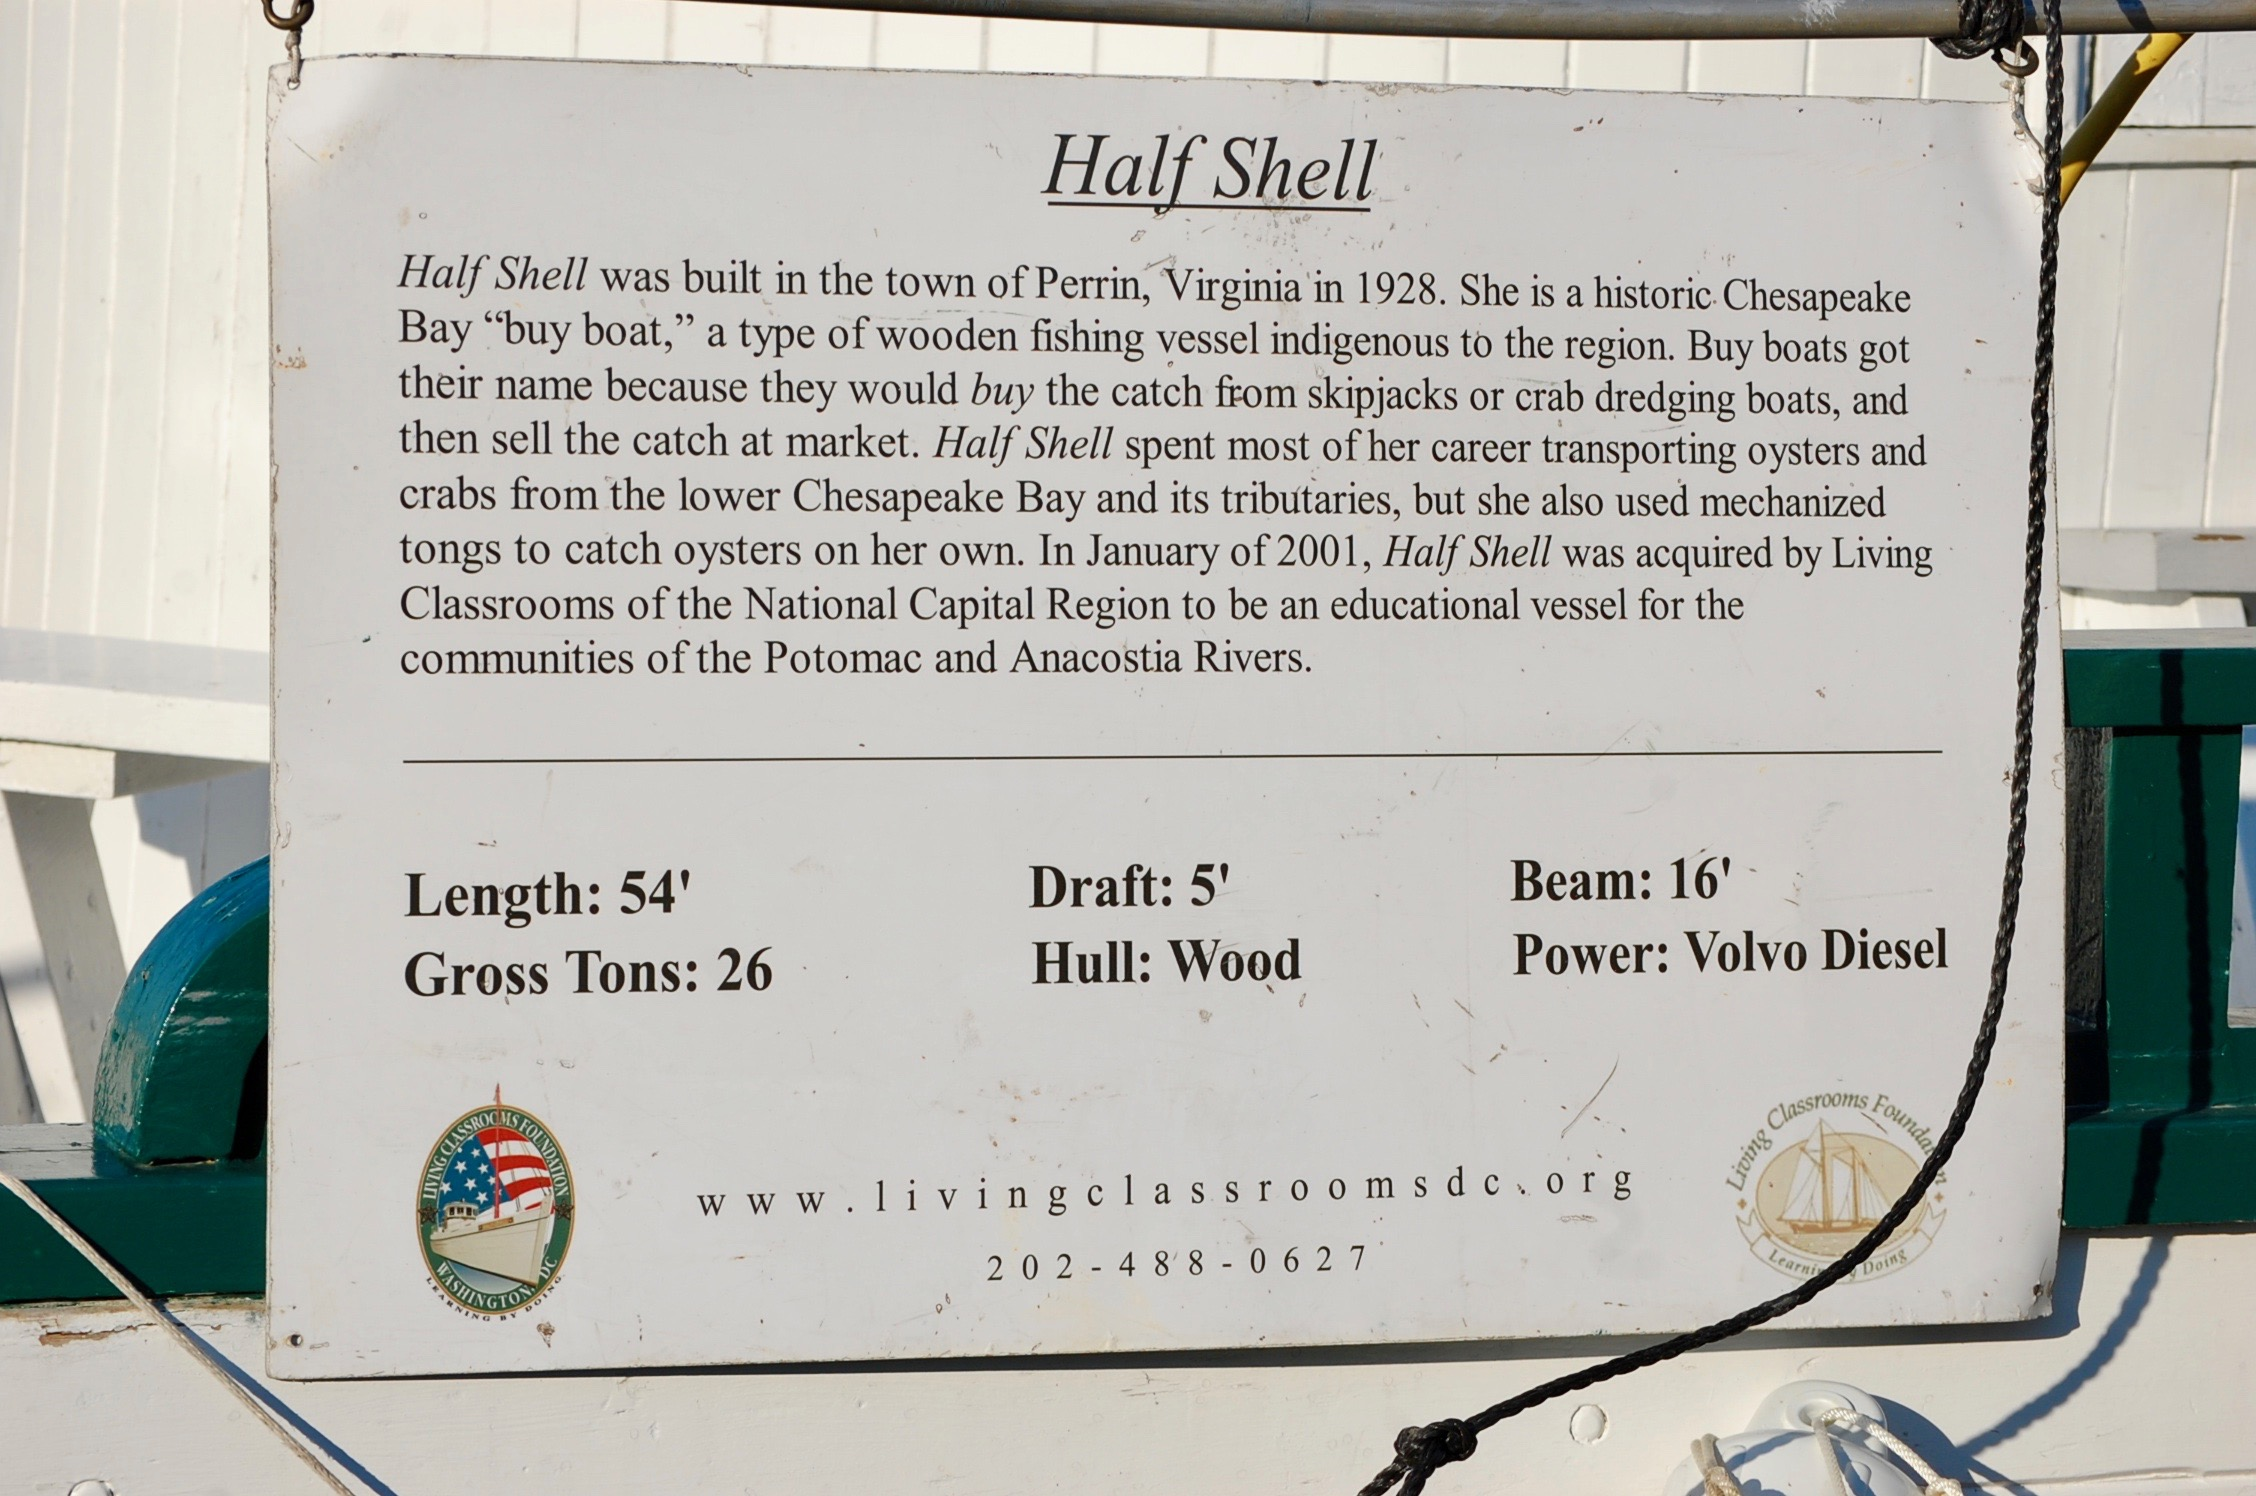 The history of Half Shell. Source: www.halfshelladventures.com